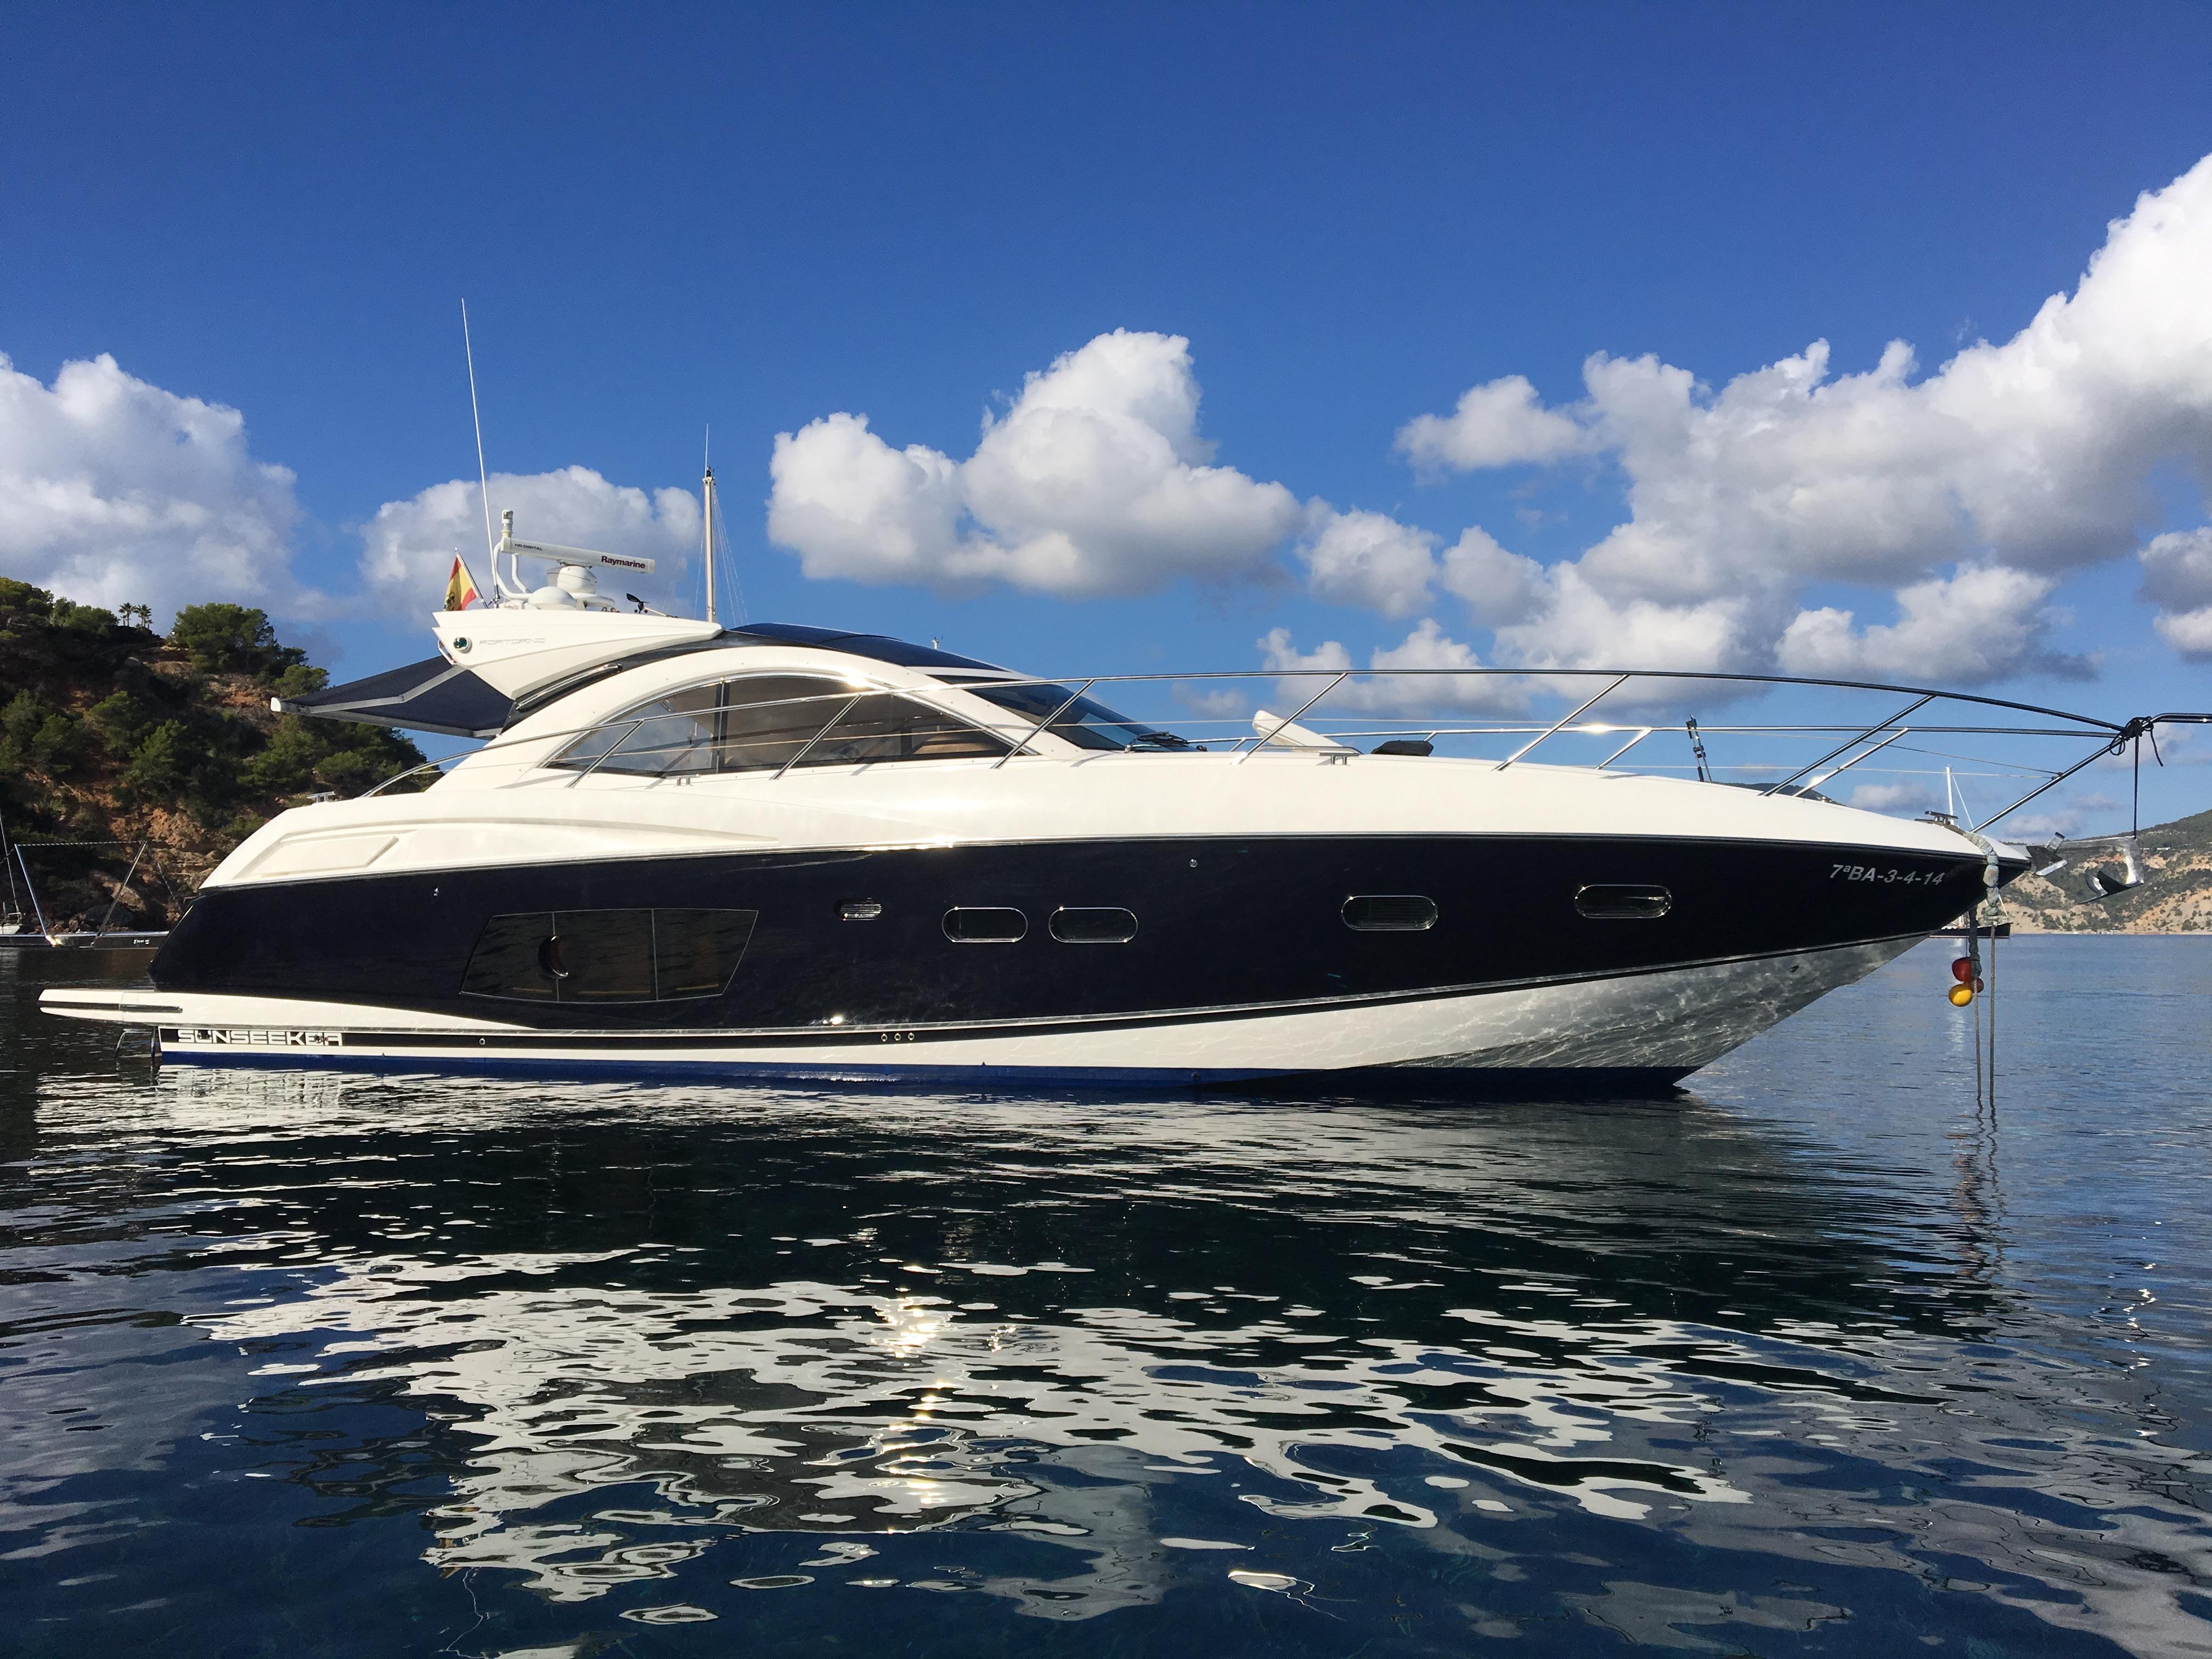 45.51 ft Sunseeker Portofino 48